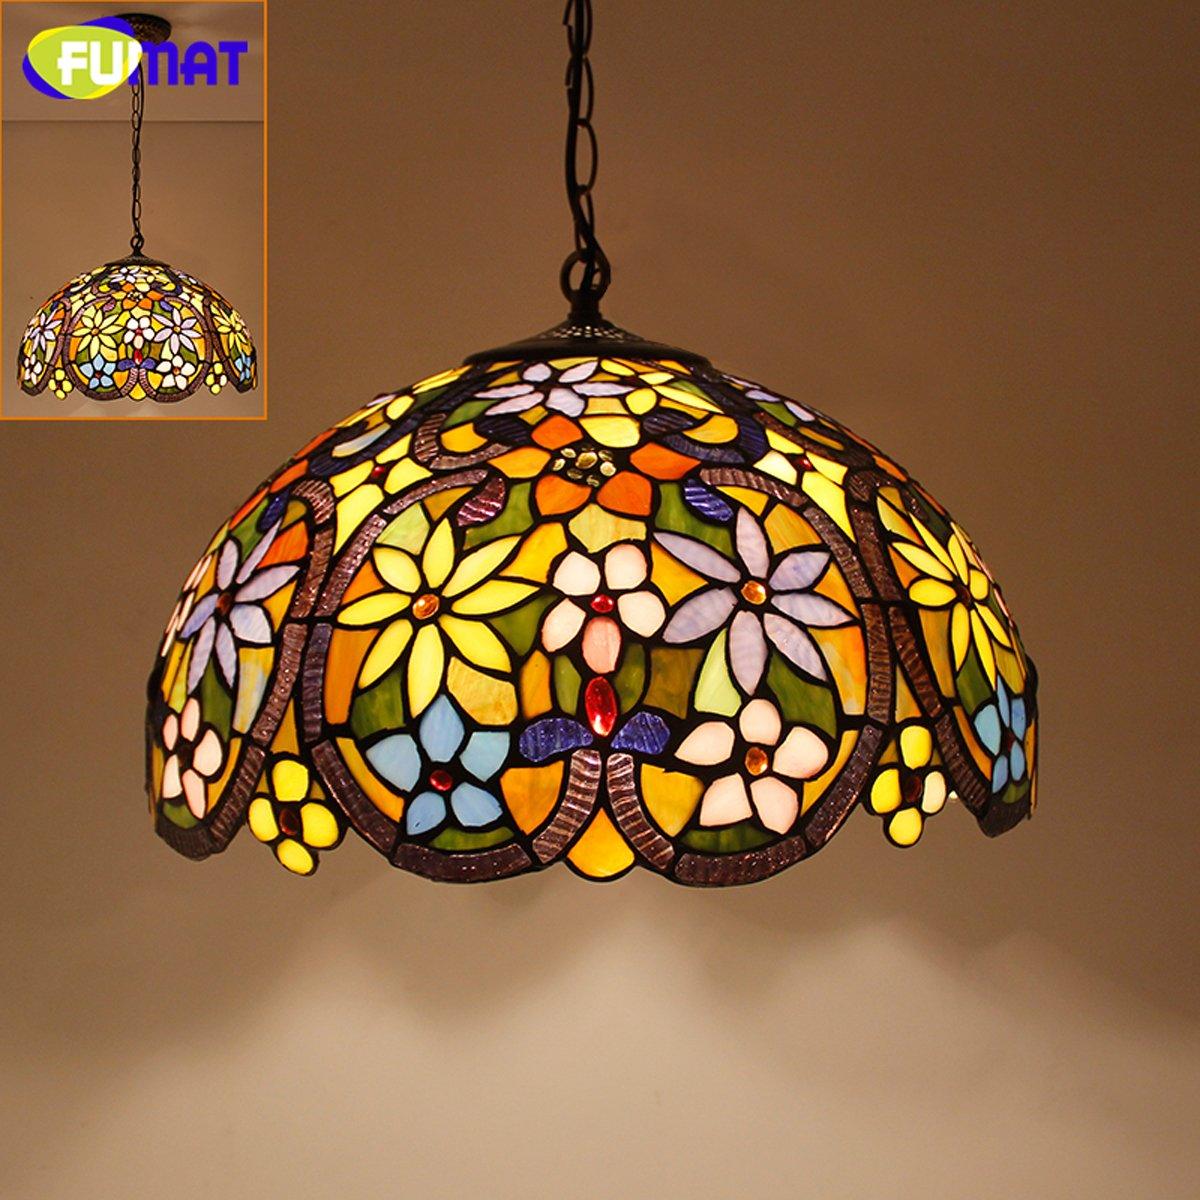 FUMAT Tiffany Pendant Light 16